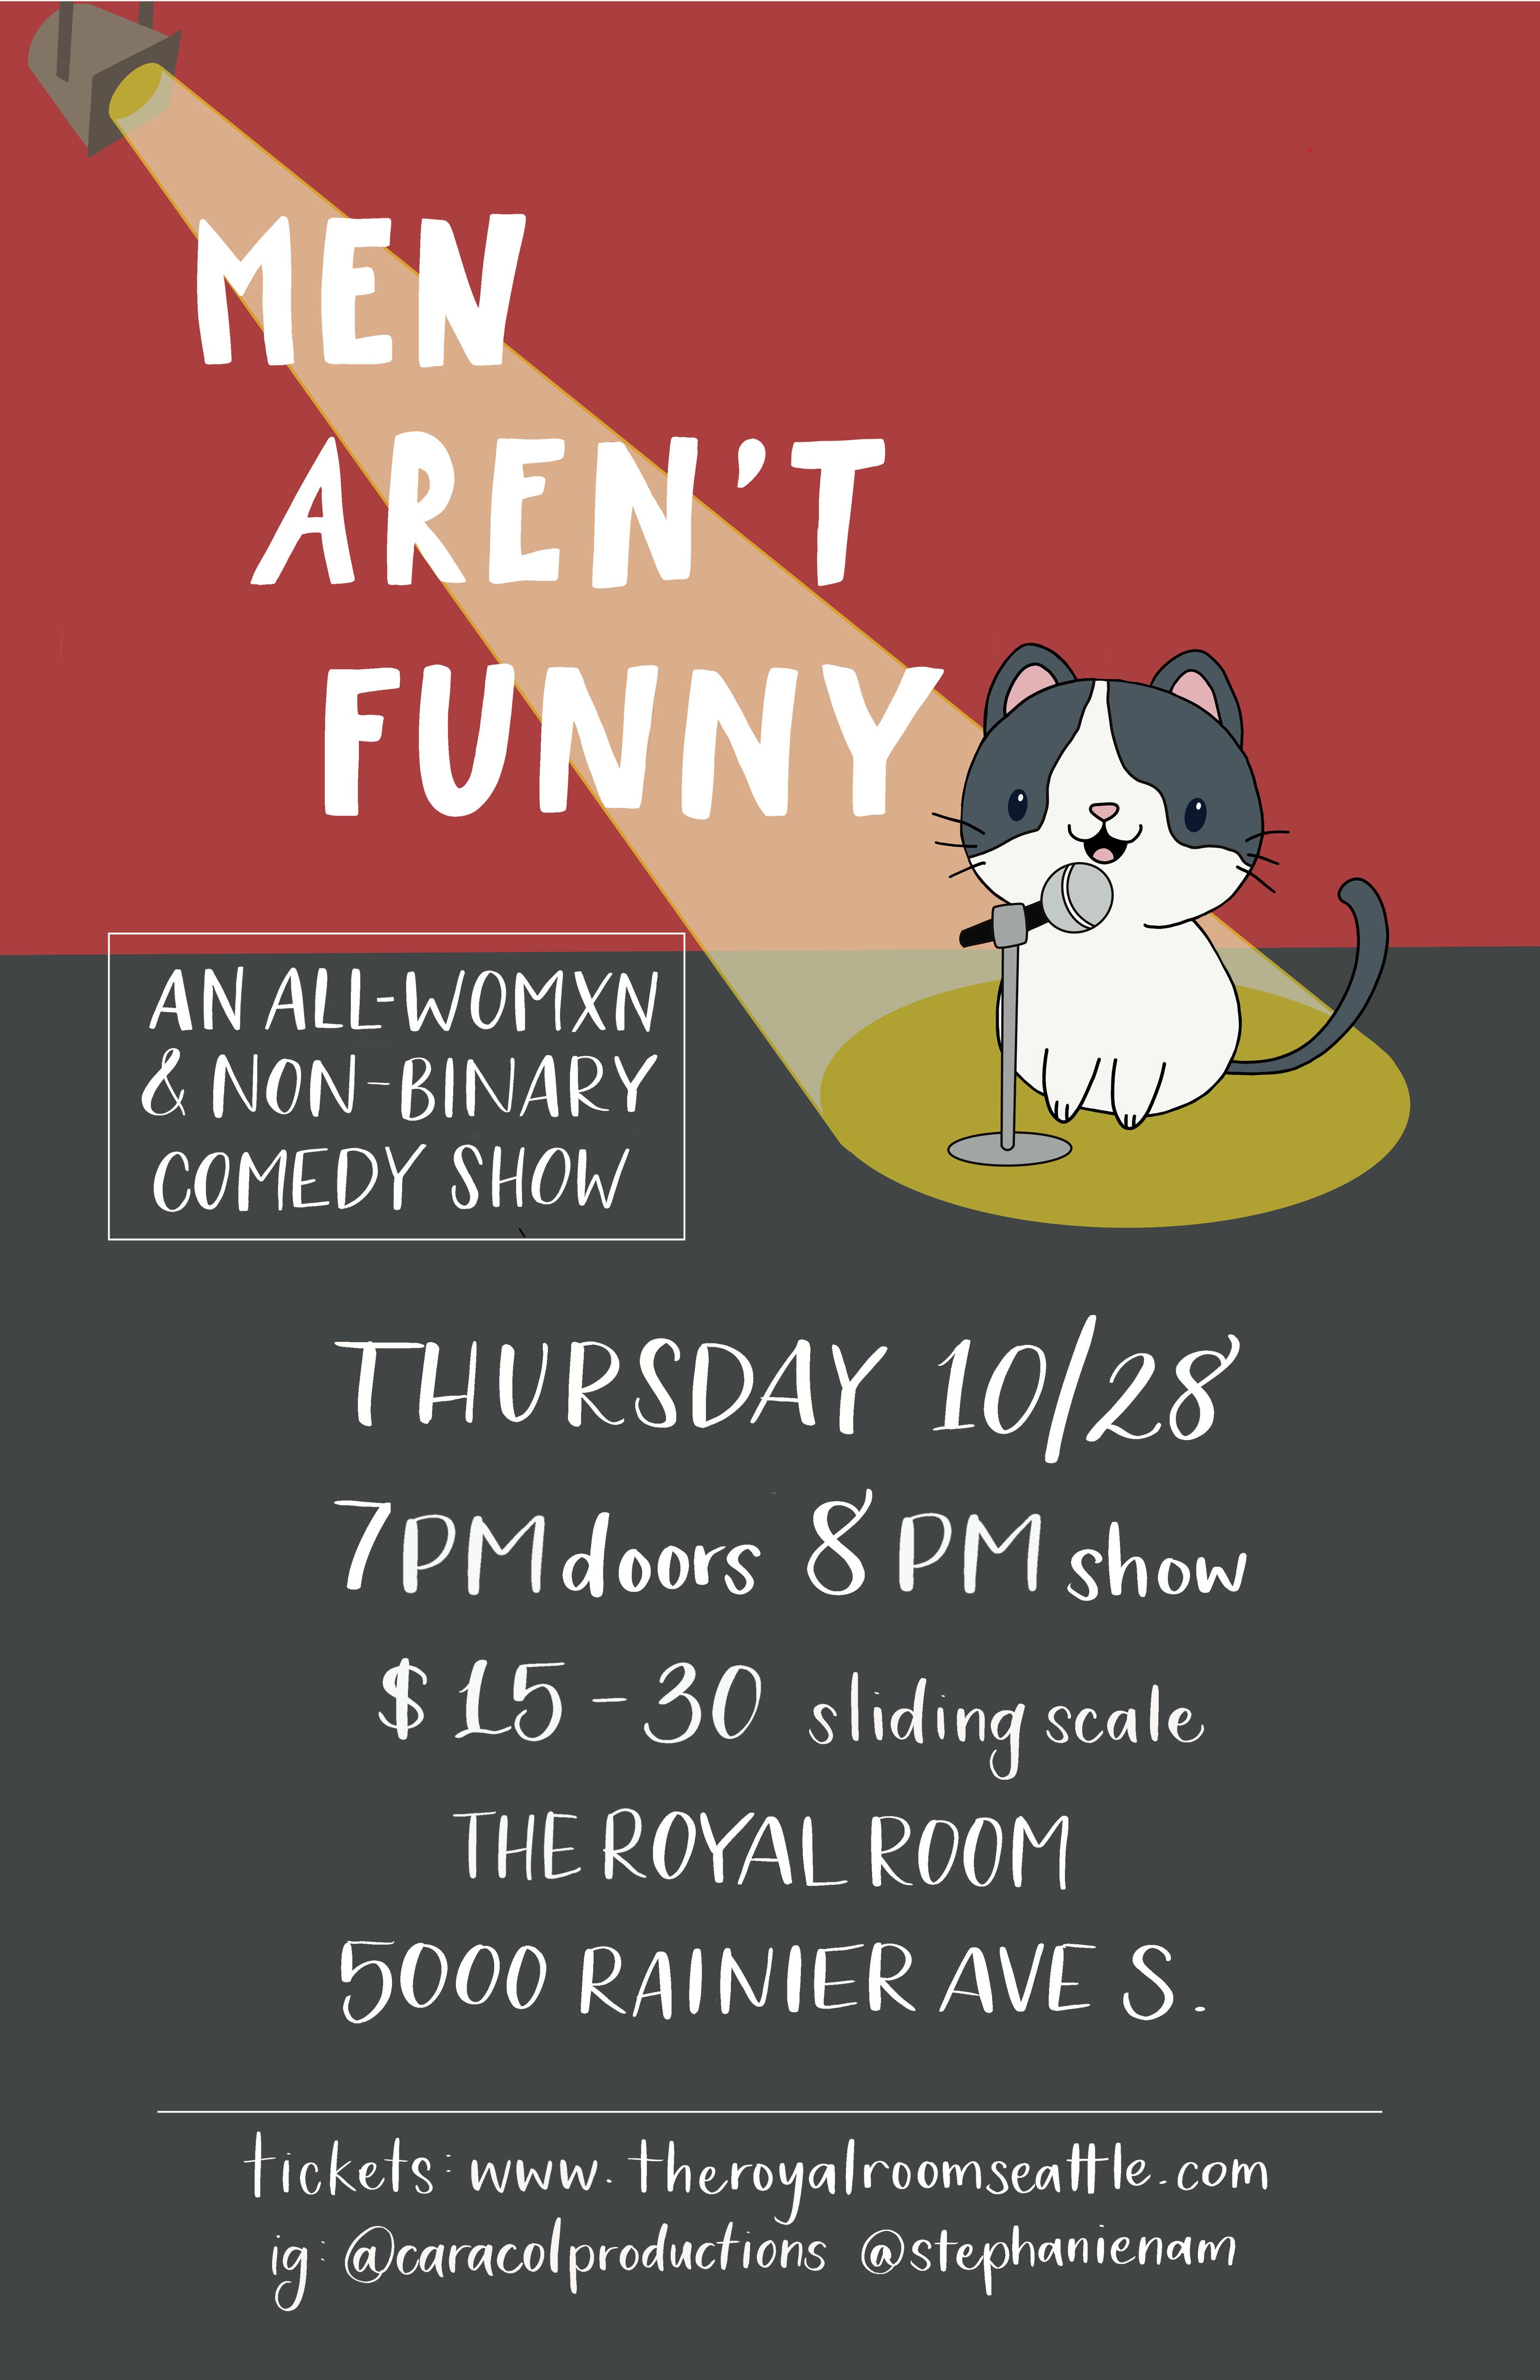 Men Aren't Funny: an all womxn & non-binary comedy show